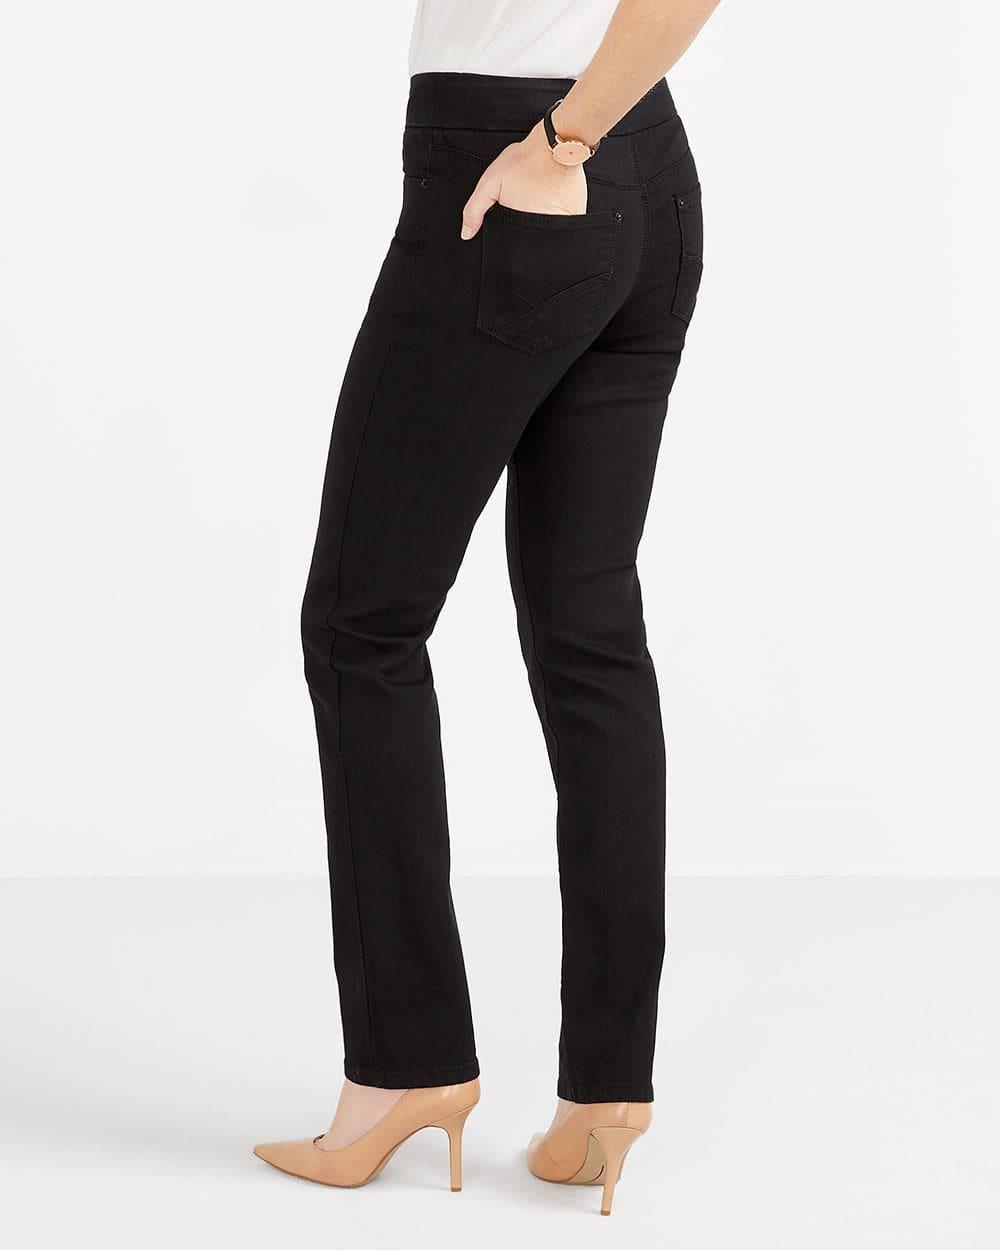 The Original Comfort Black Jeans